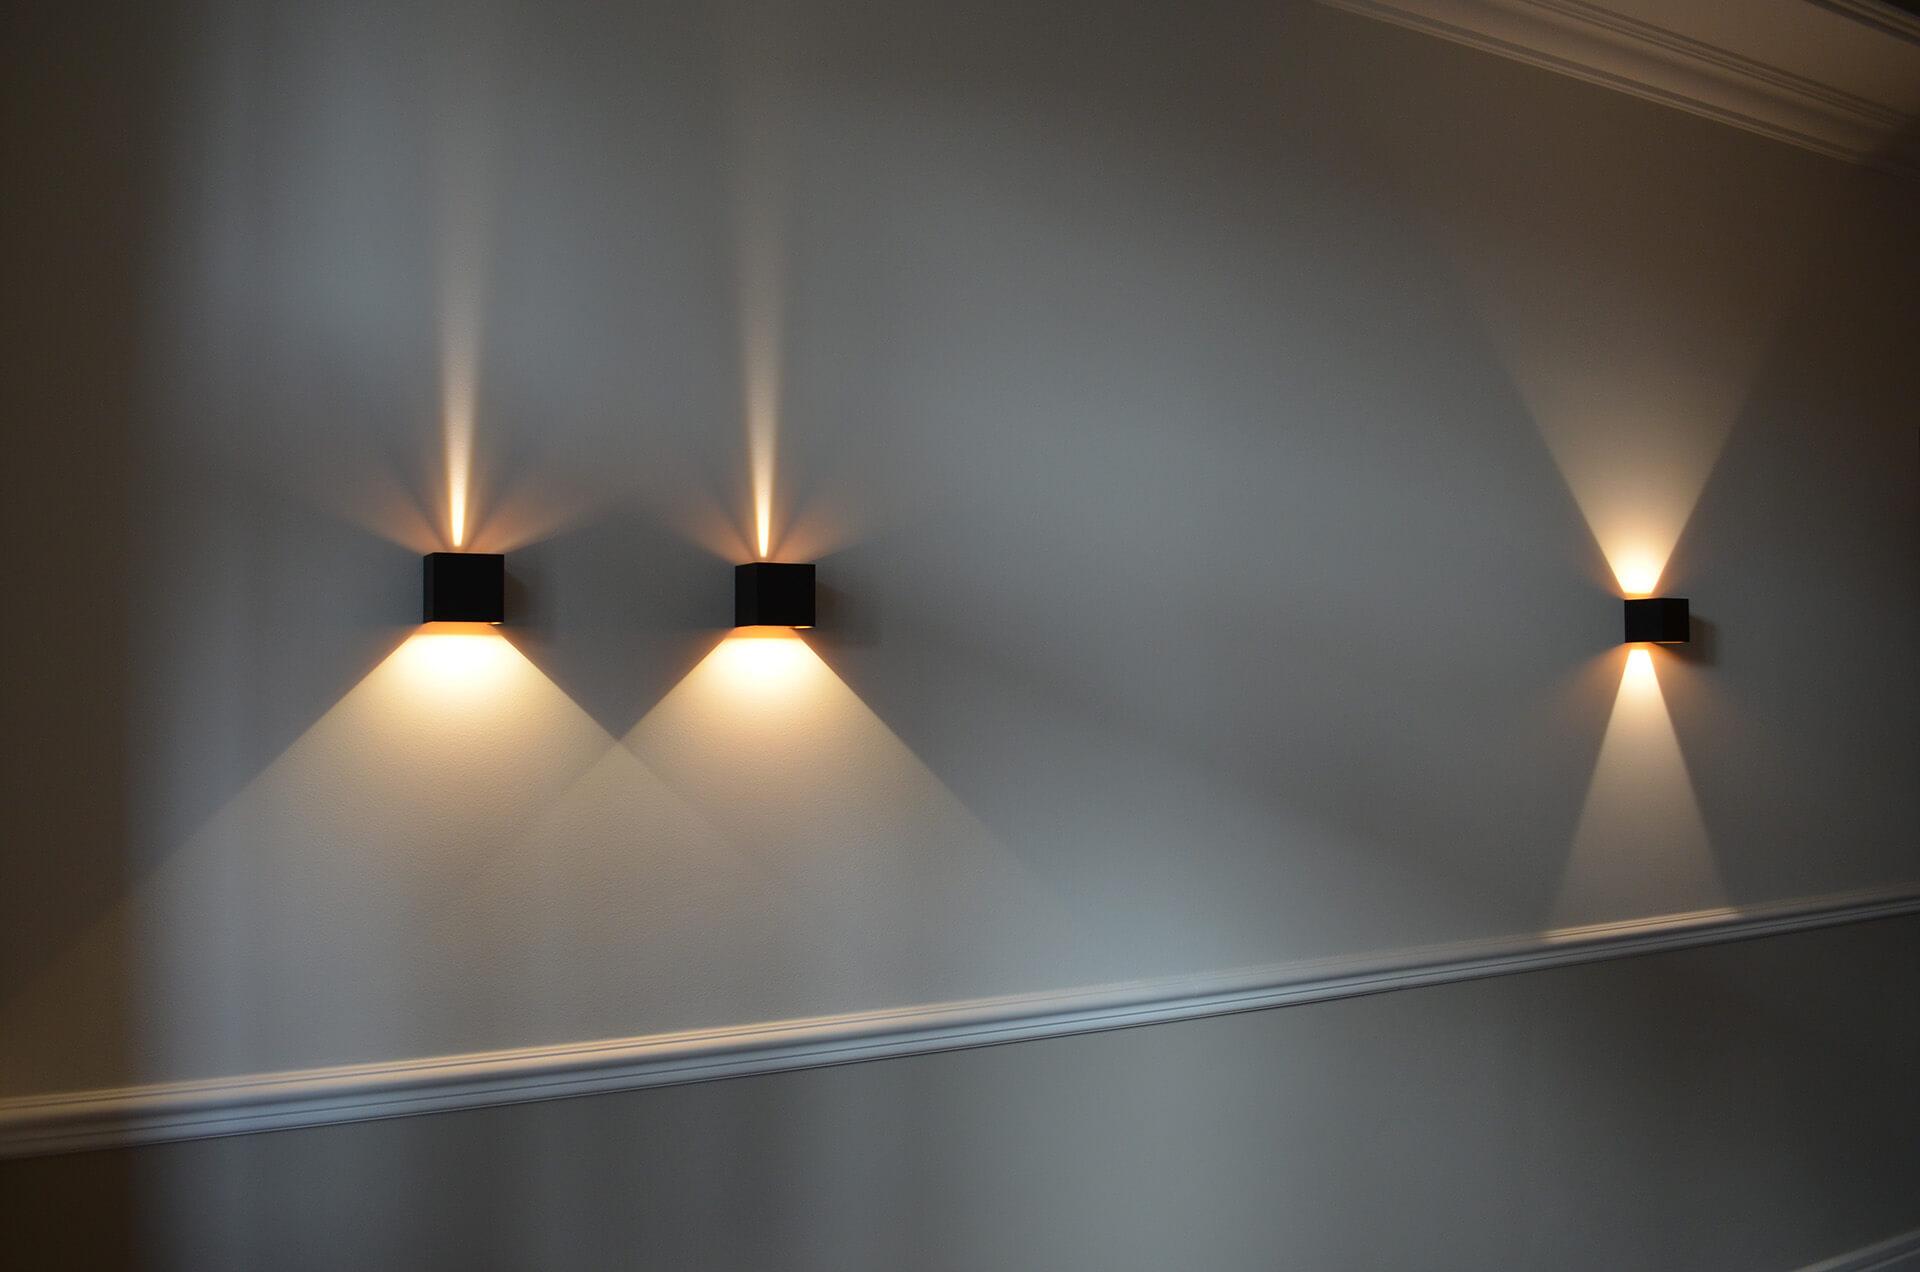 Lichtplanung & Lichtberatung